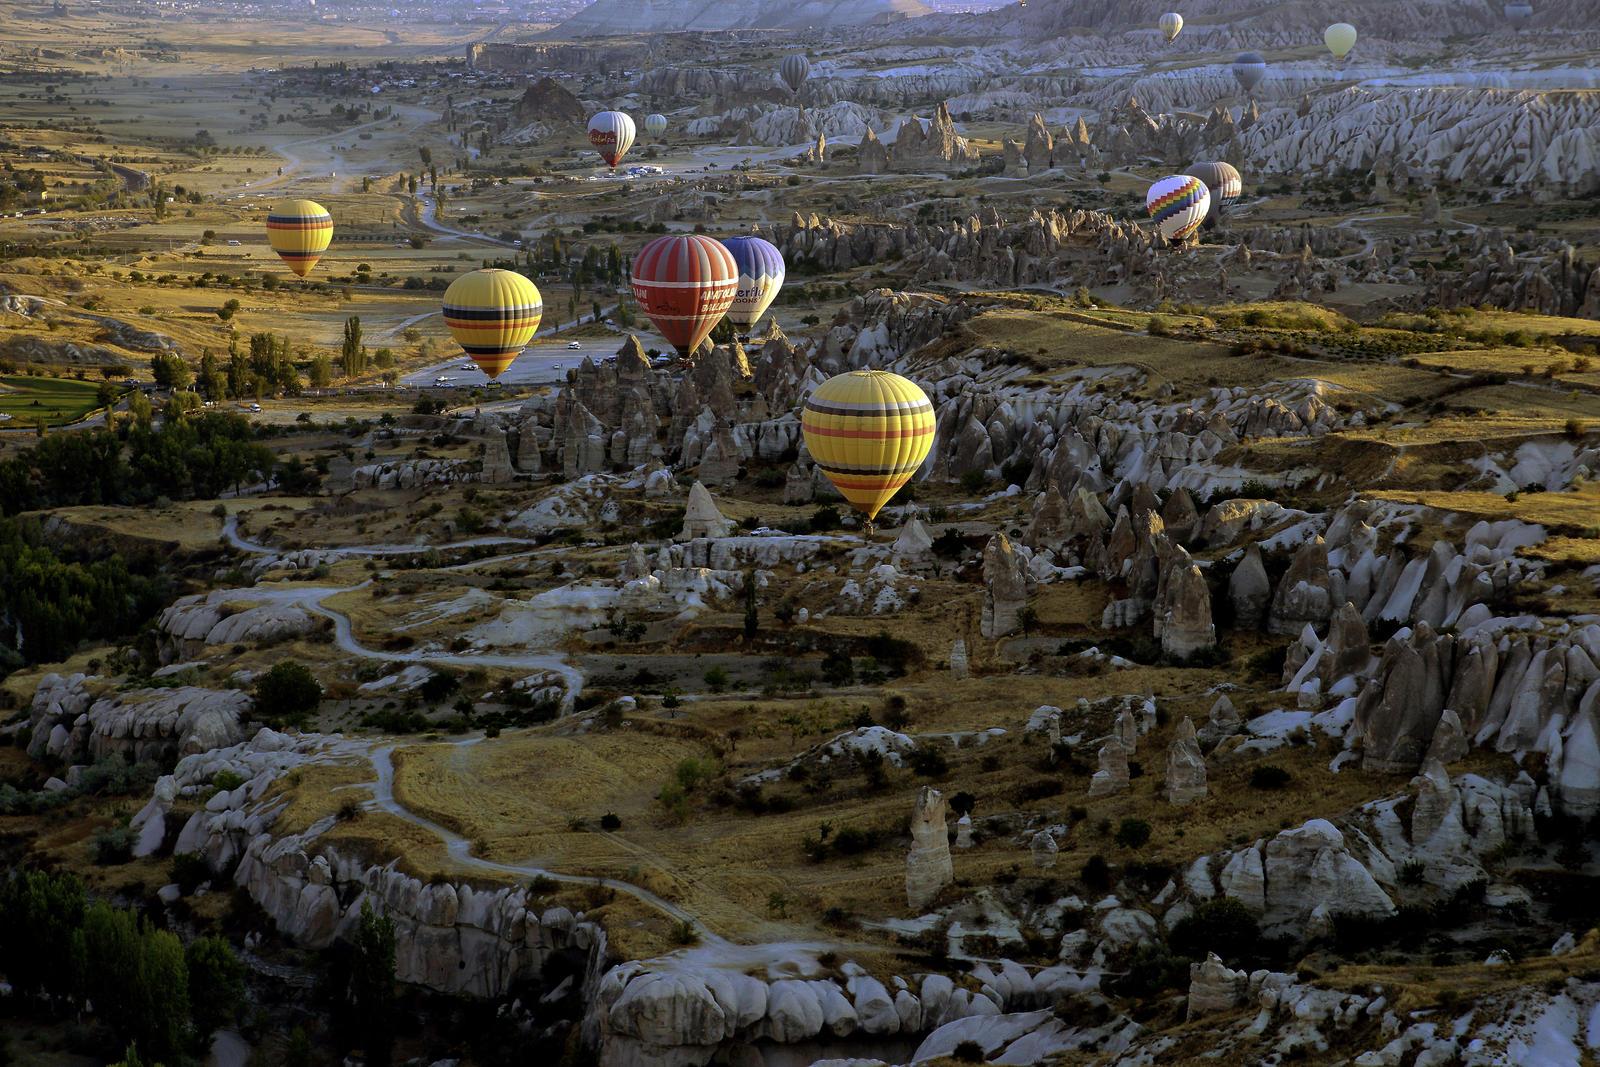 Sunrise over Cappadocia 2 by CitizenFresh